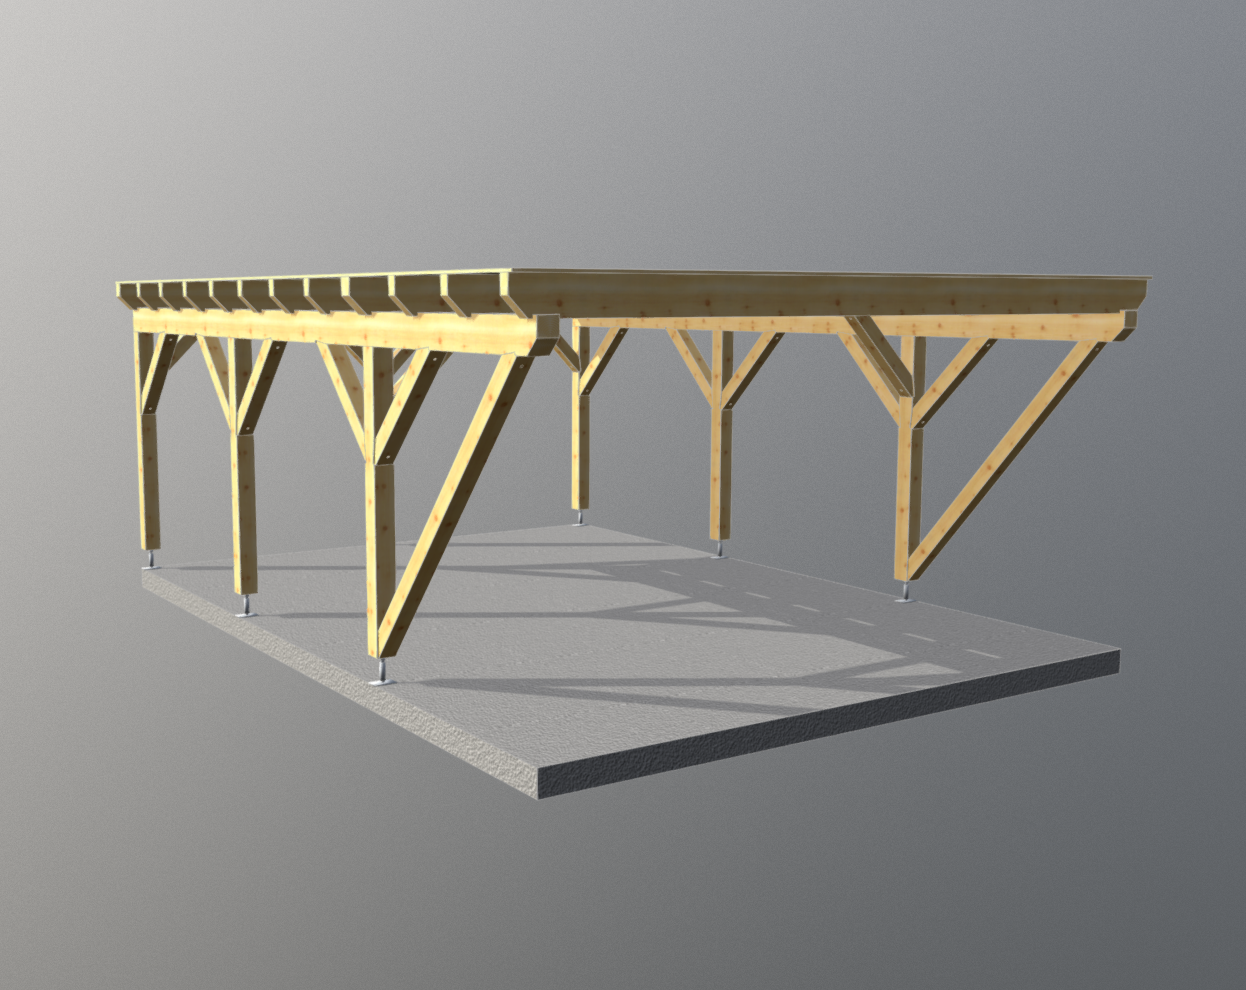 Holz carport flachdach 5m x 6m, carports aus polen ...